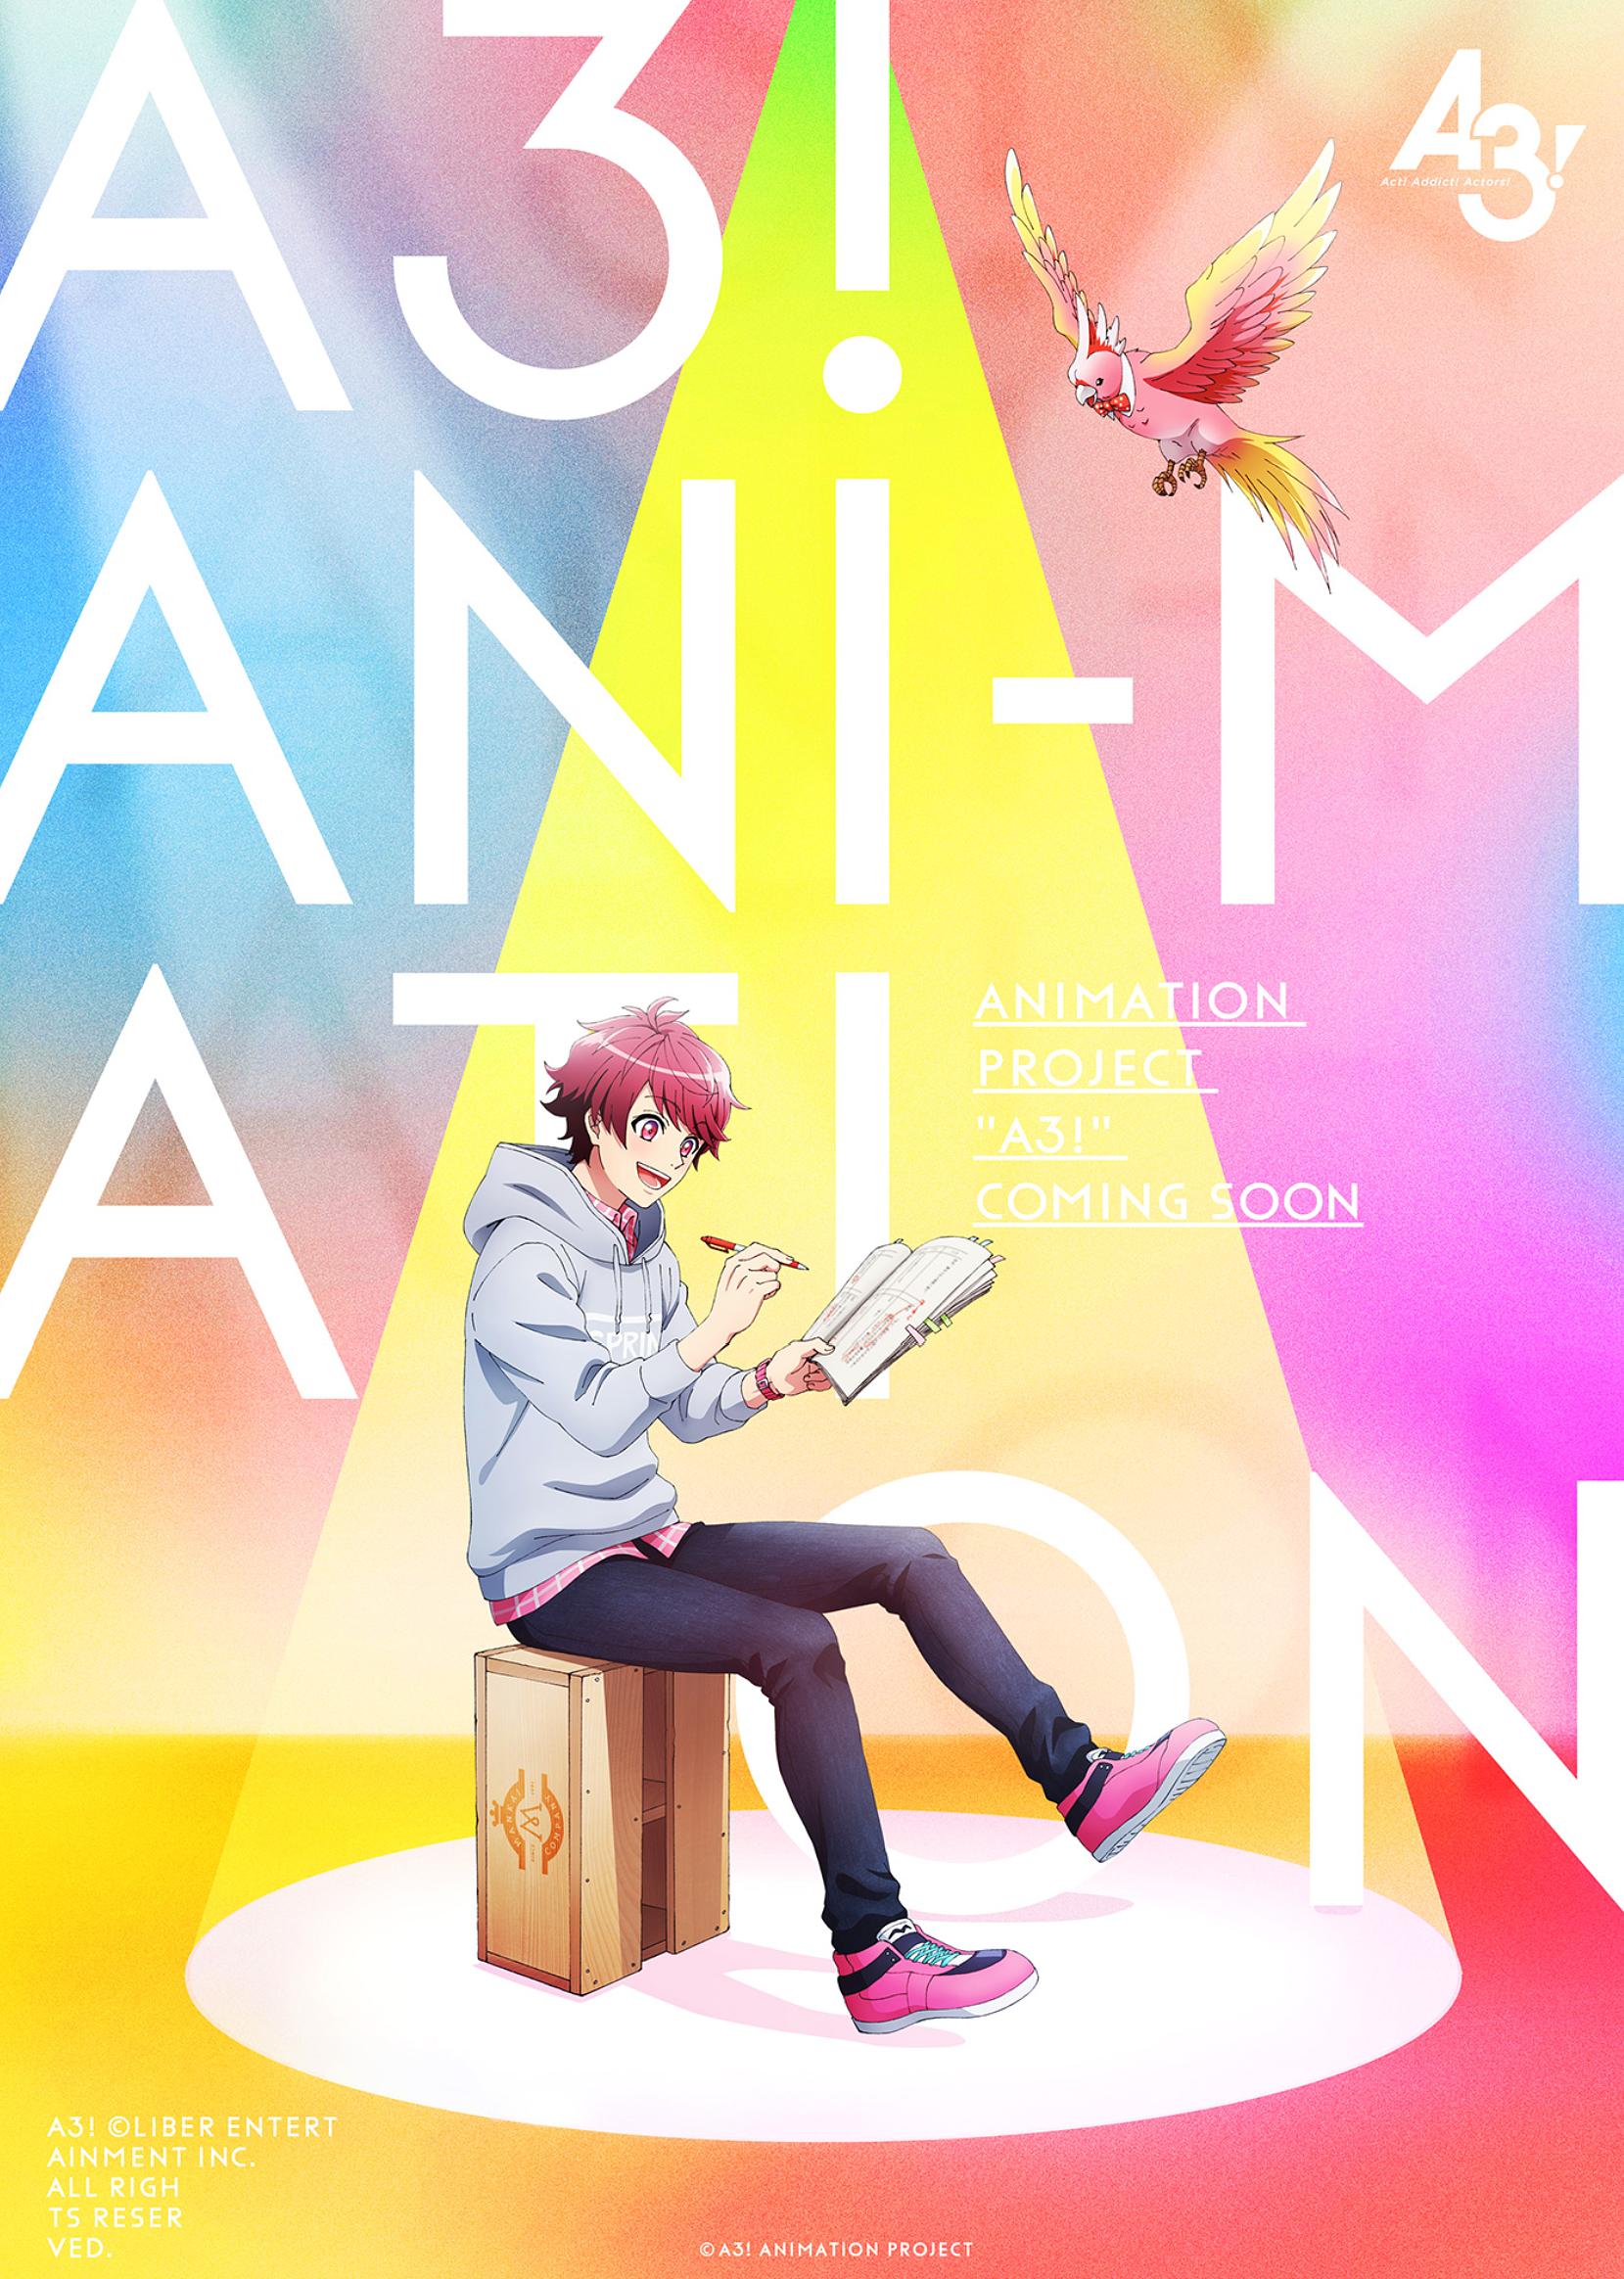 Anime/Gallery